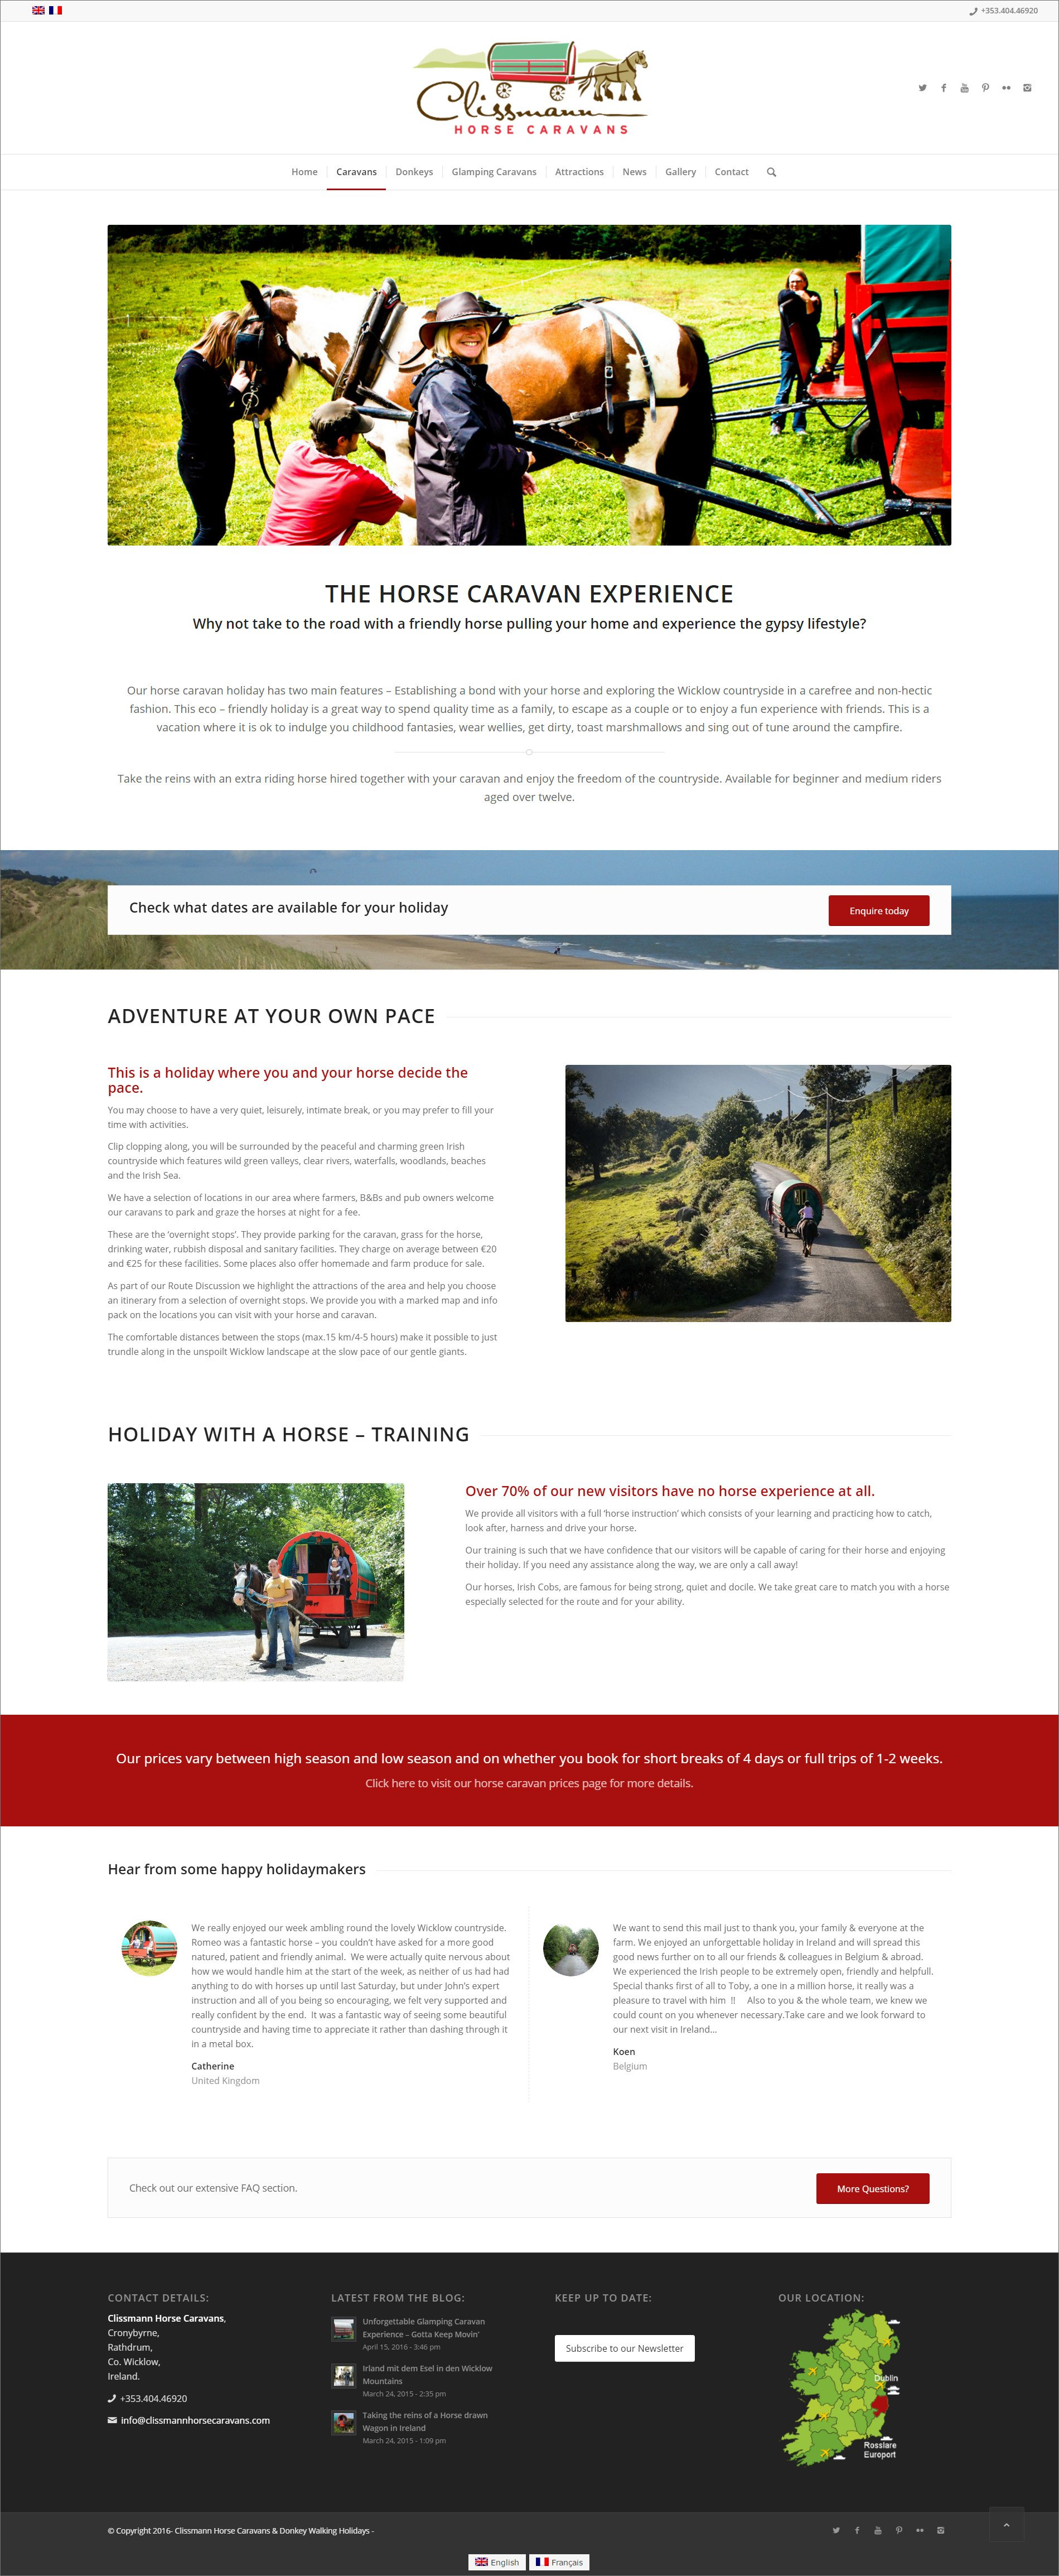 Ridge-Design-Website-Design-Clissmann-Horse-Caravans